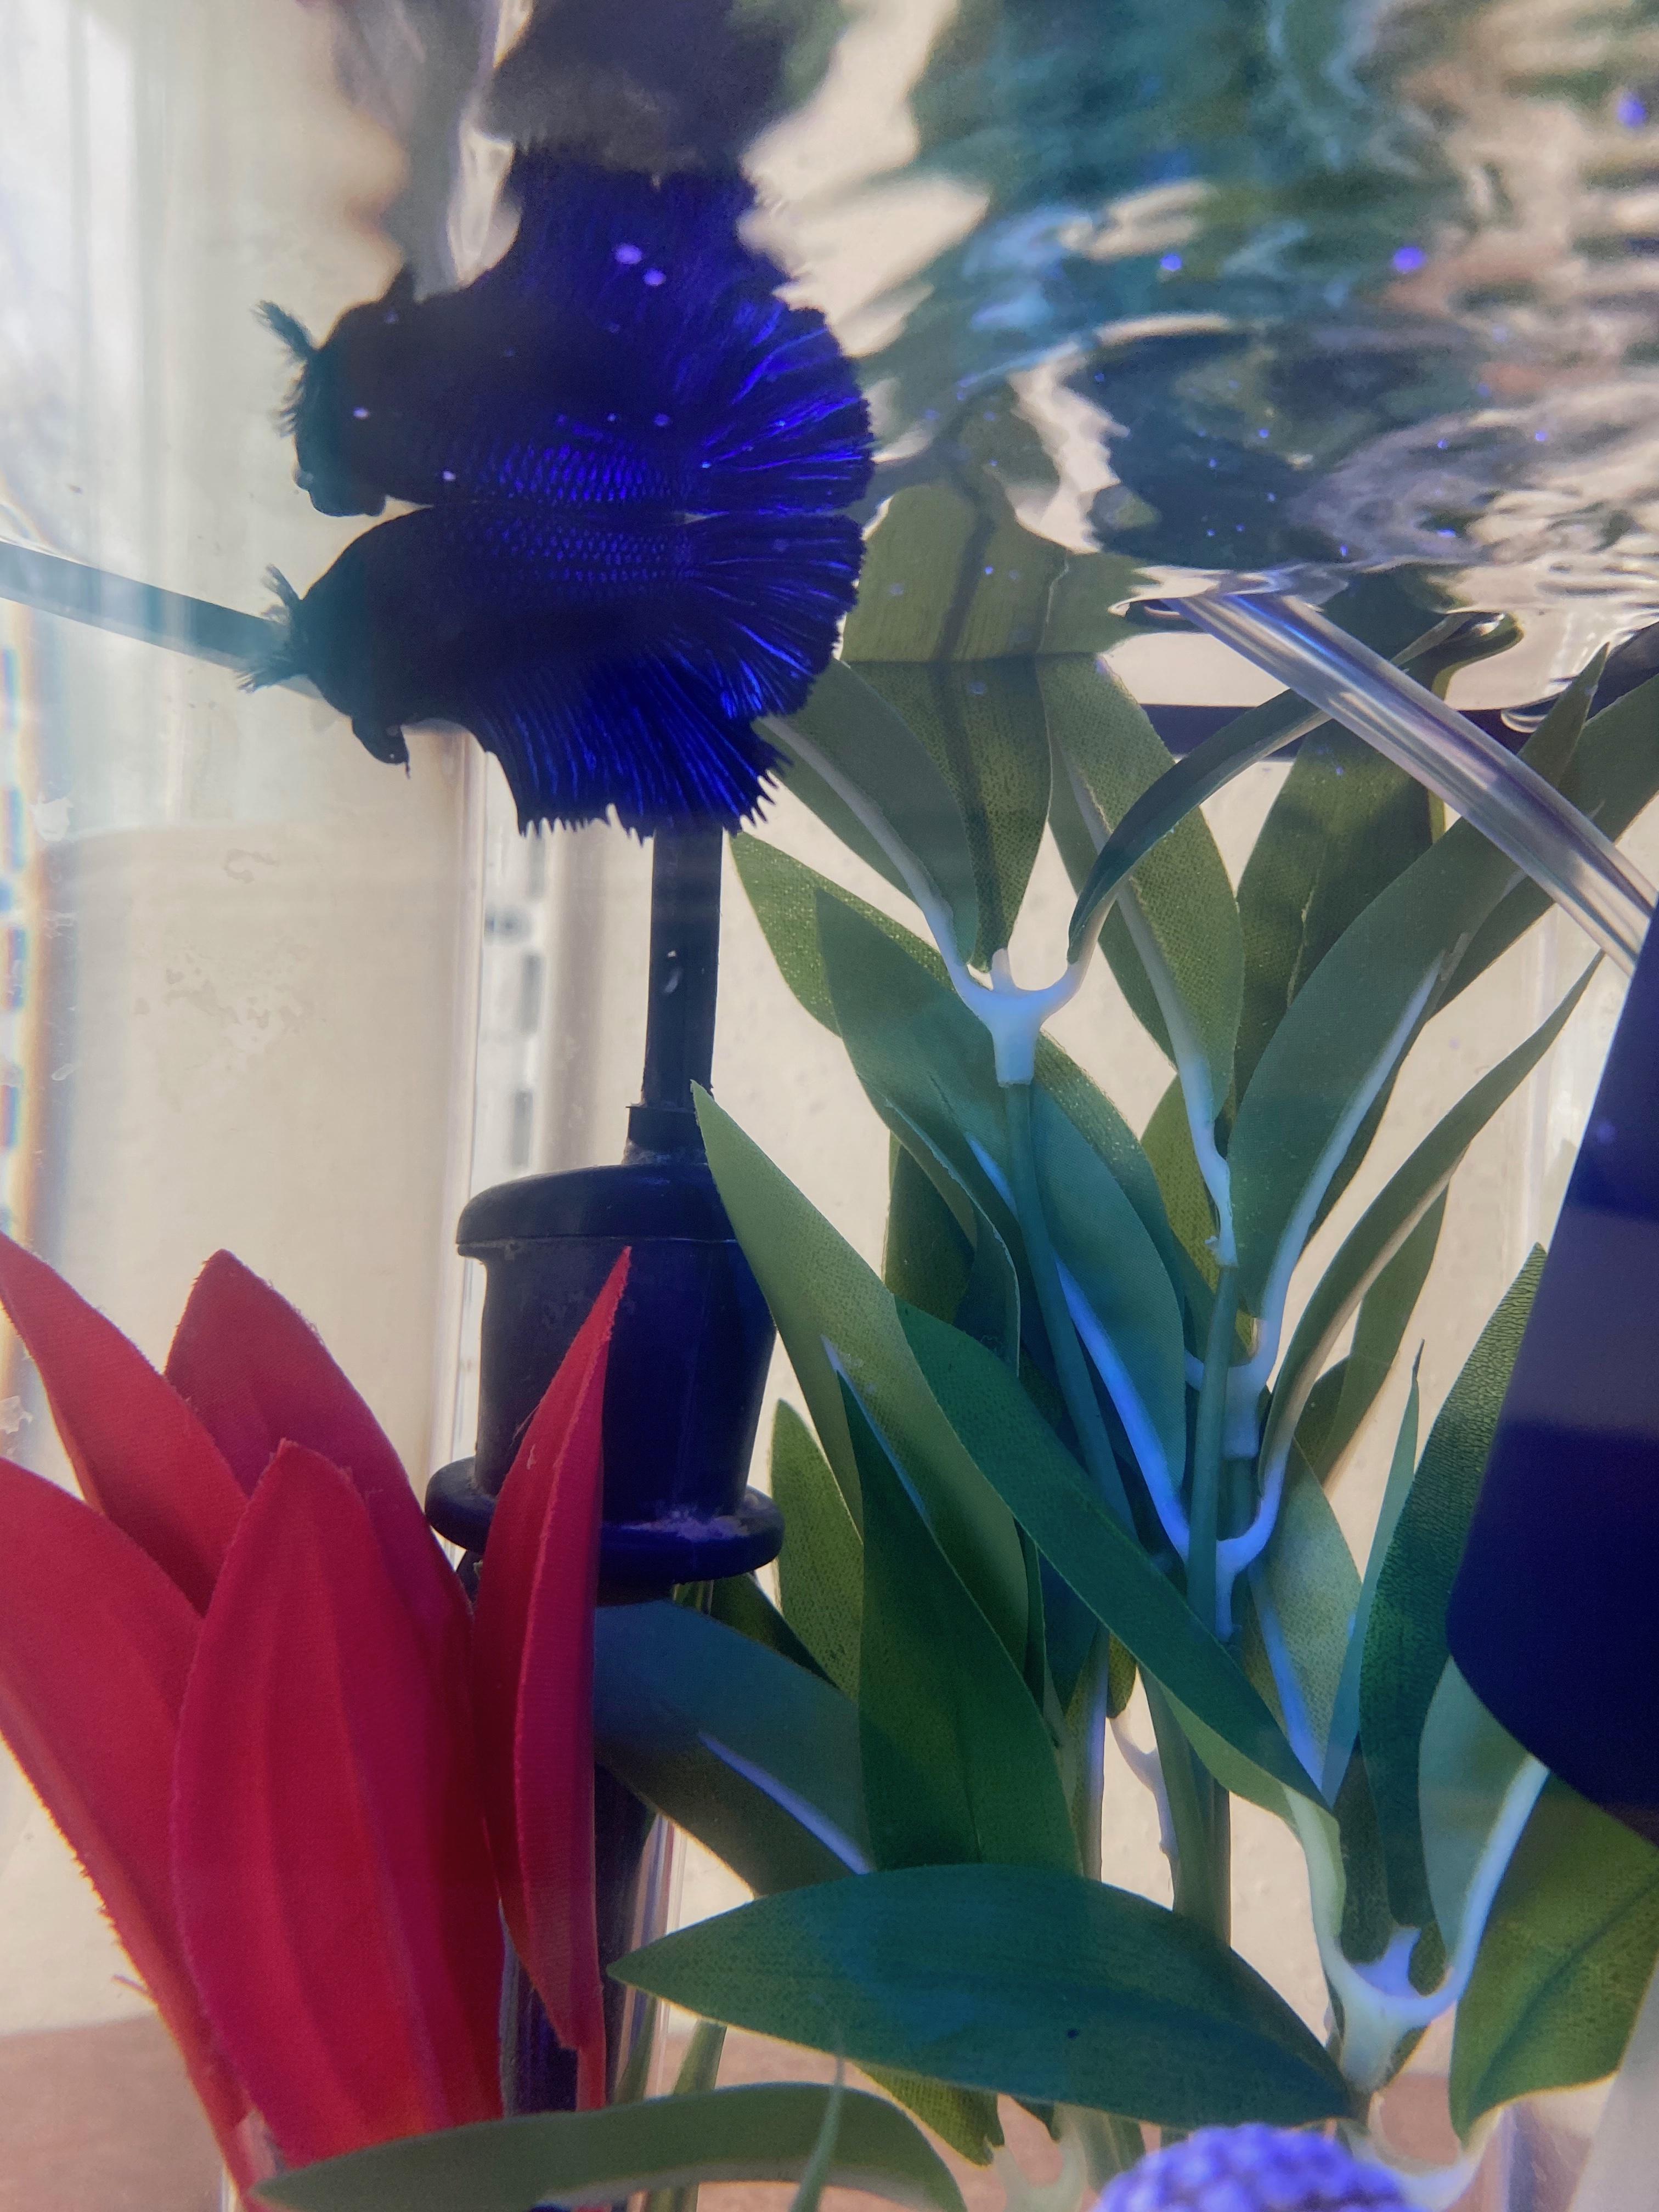 SU sophomore Ariel Samuel's betta fish, Raven, swims in her bowl in Samuel's South Campus apartment.